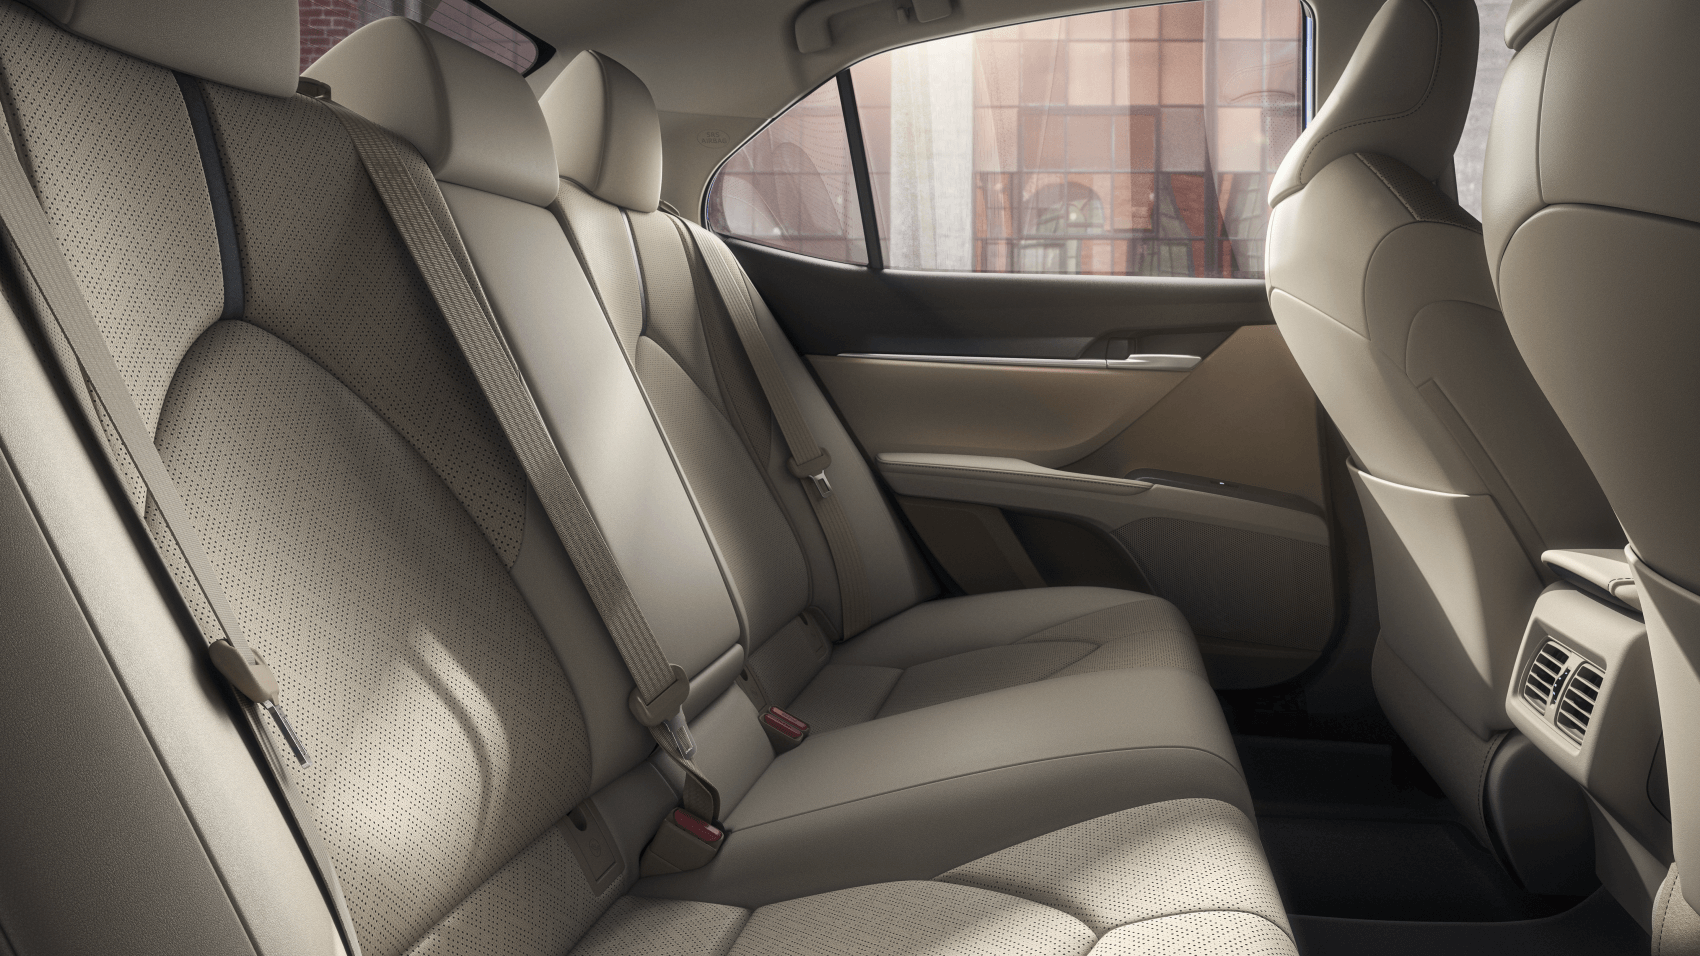 2021 Toyota Camry Interior Cabin Space Harr Toyota